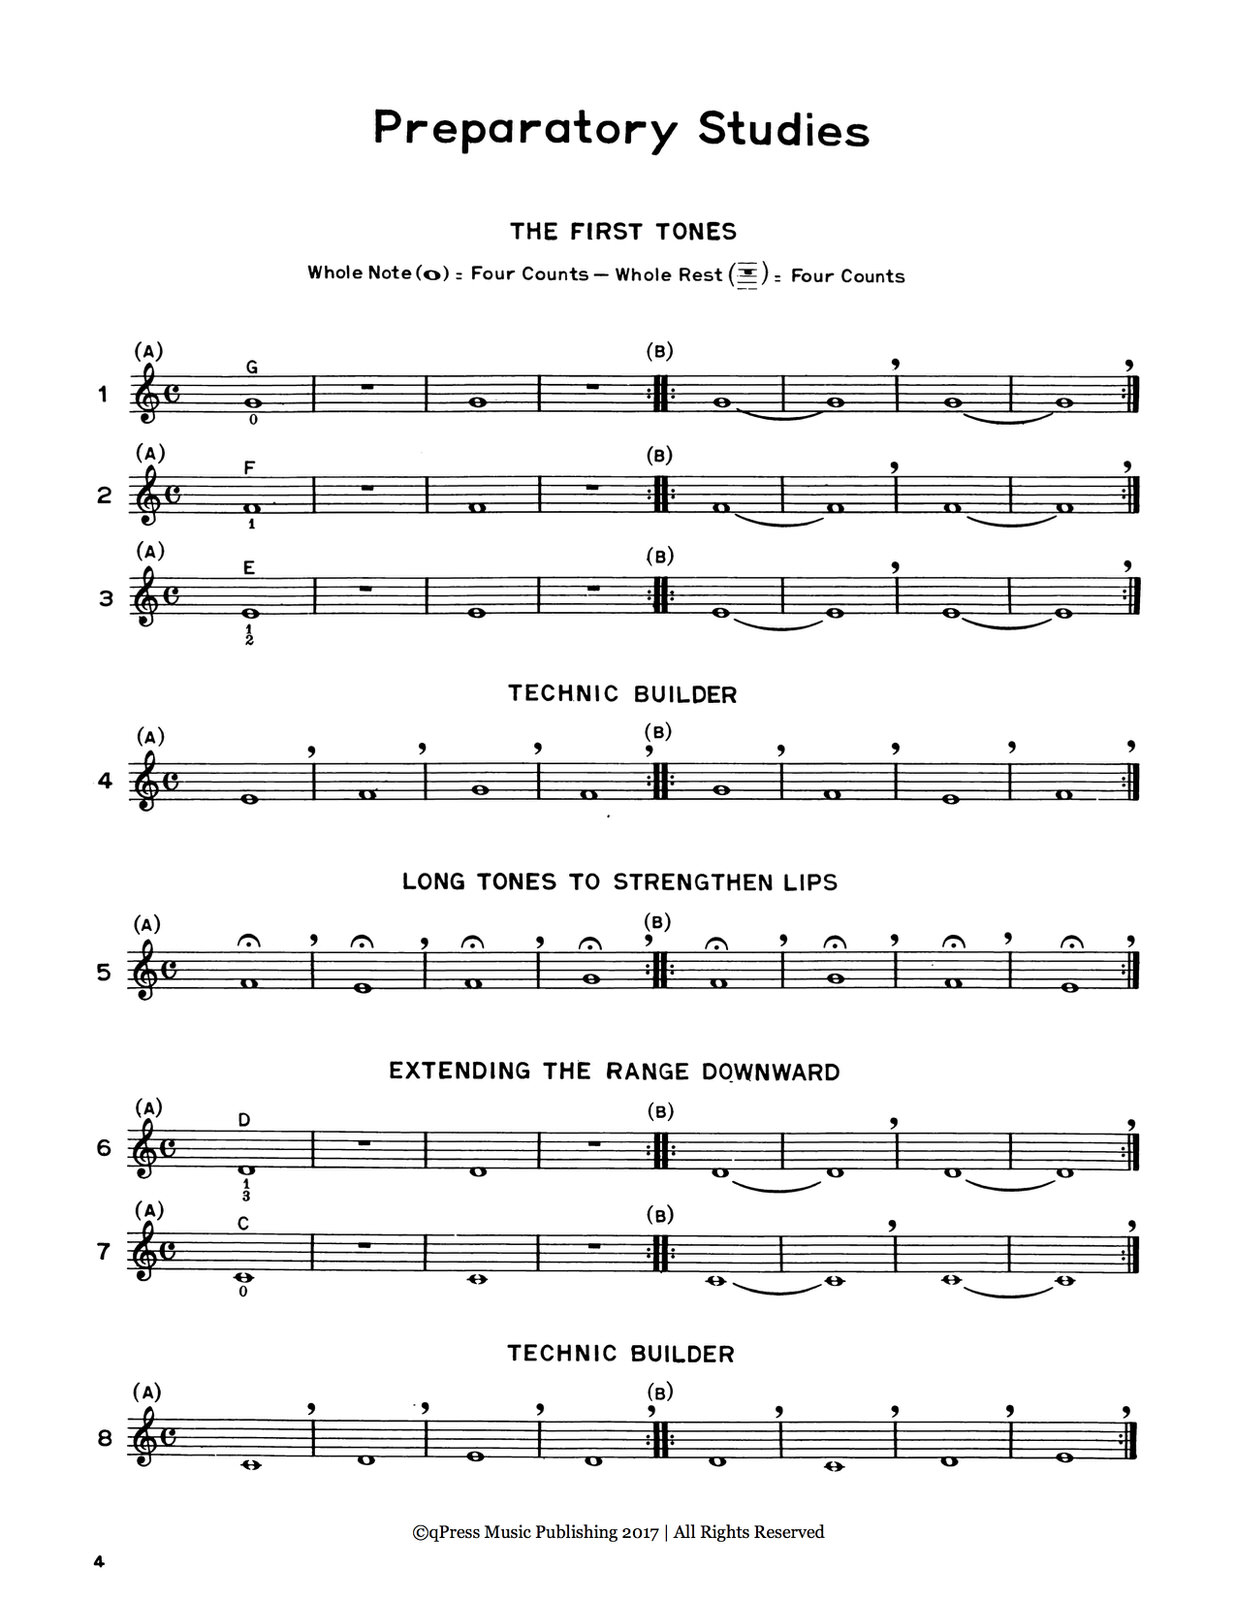 Whistler, Modern Arban-St.Jacome for Trumpet 3